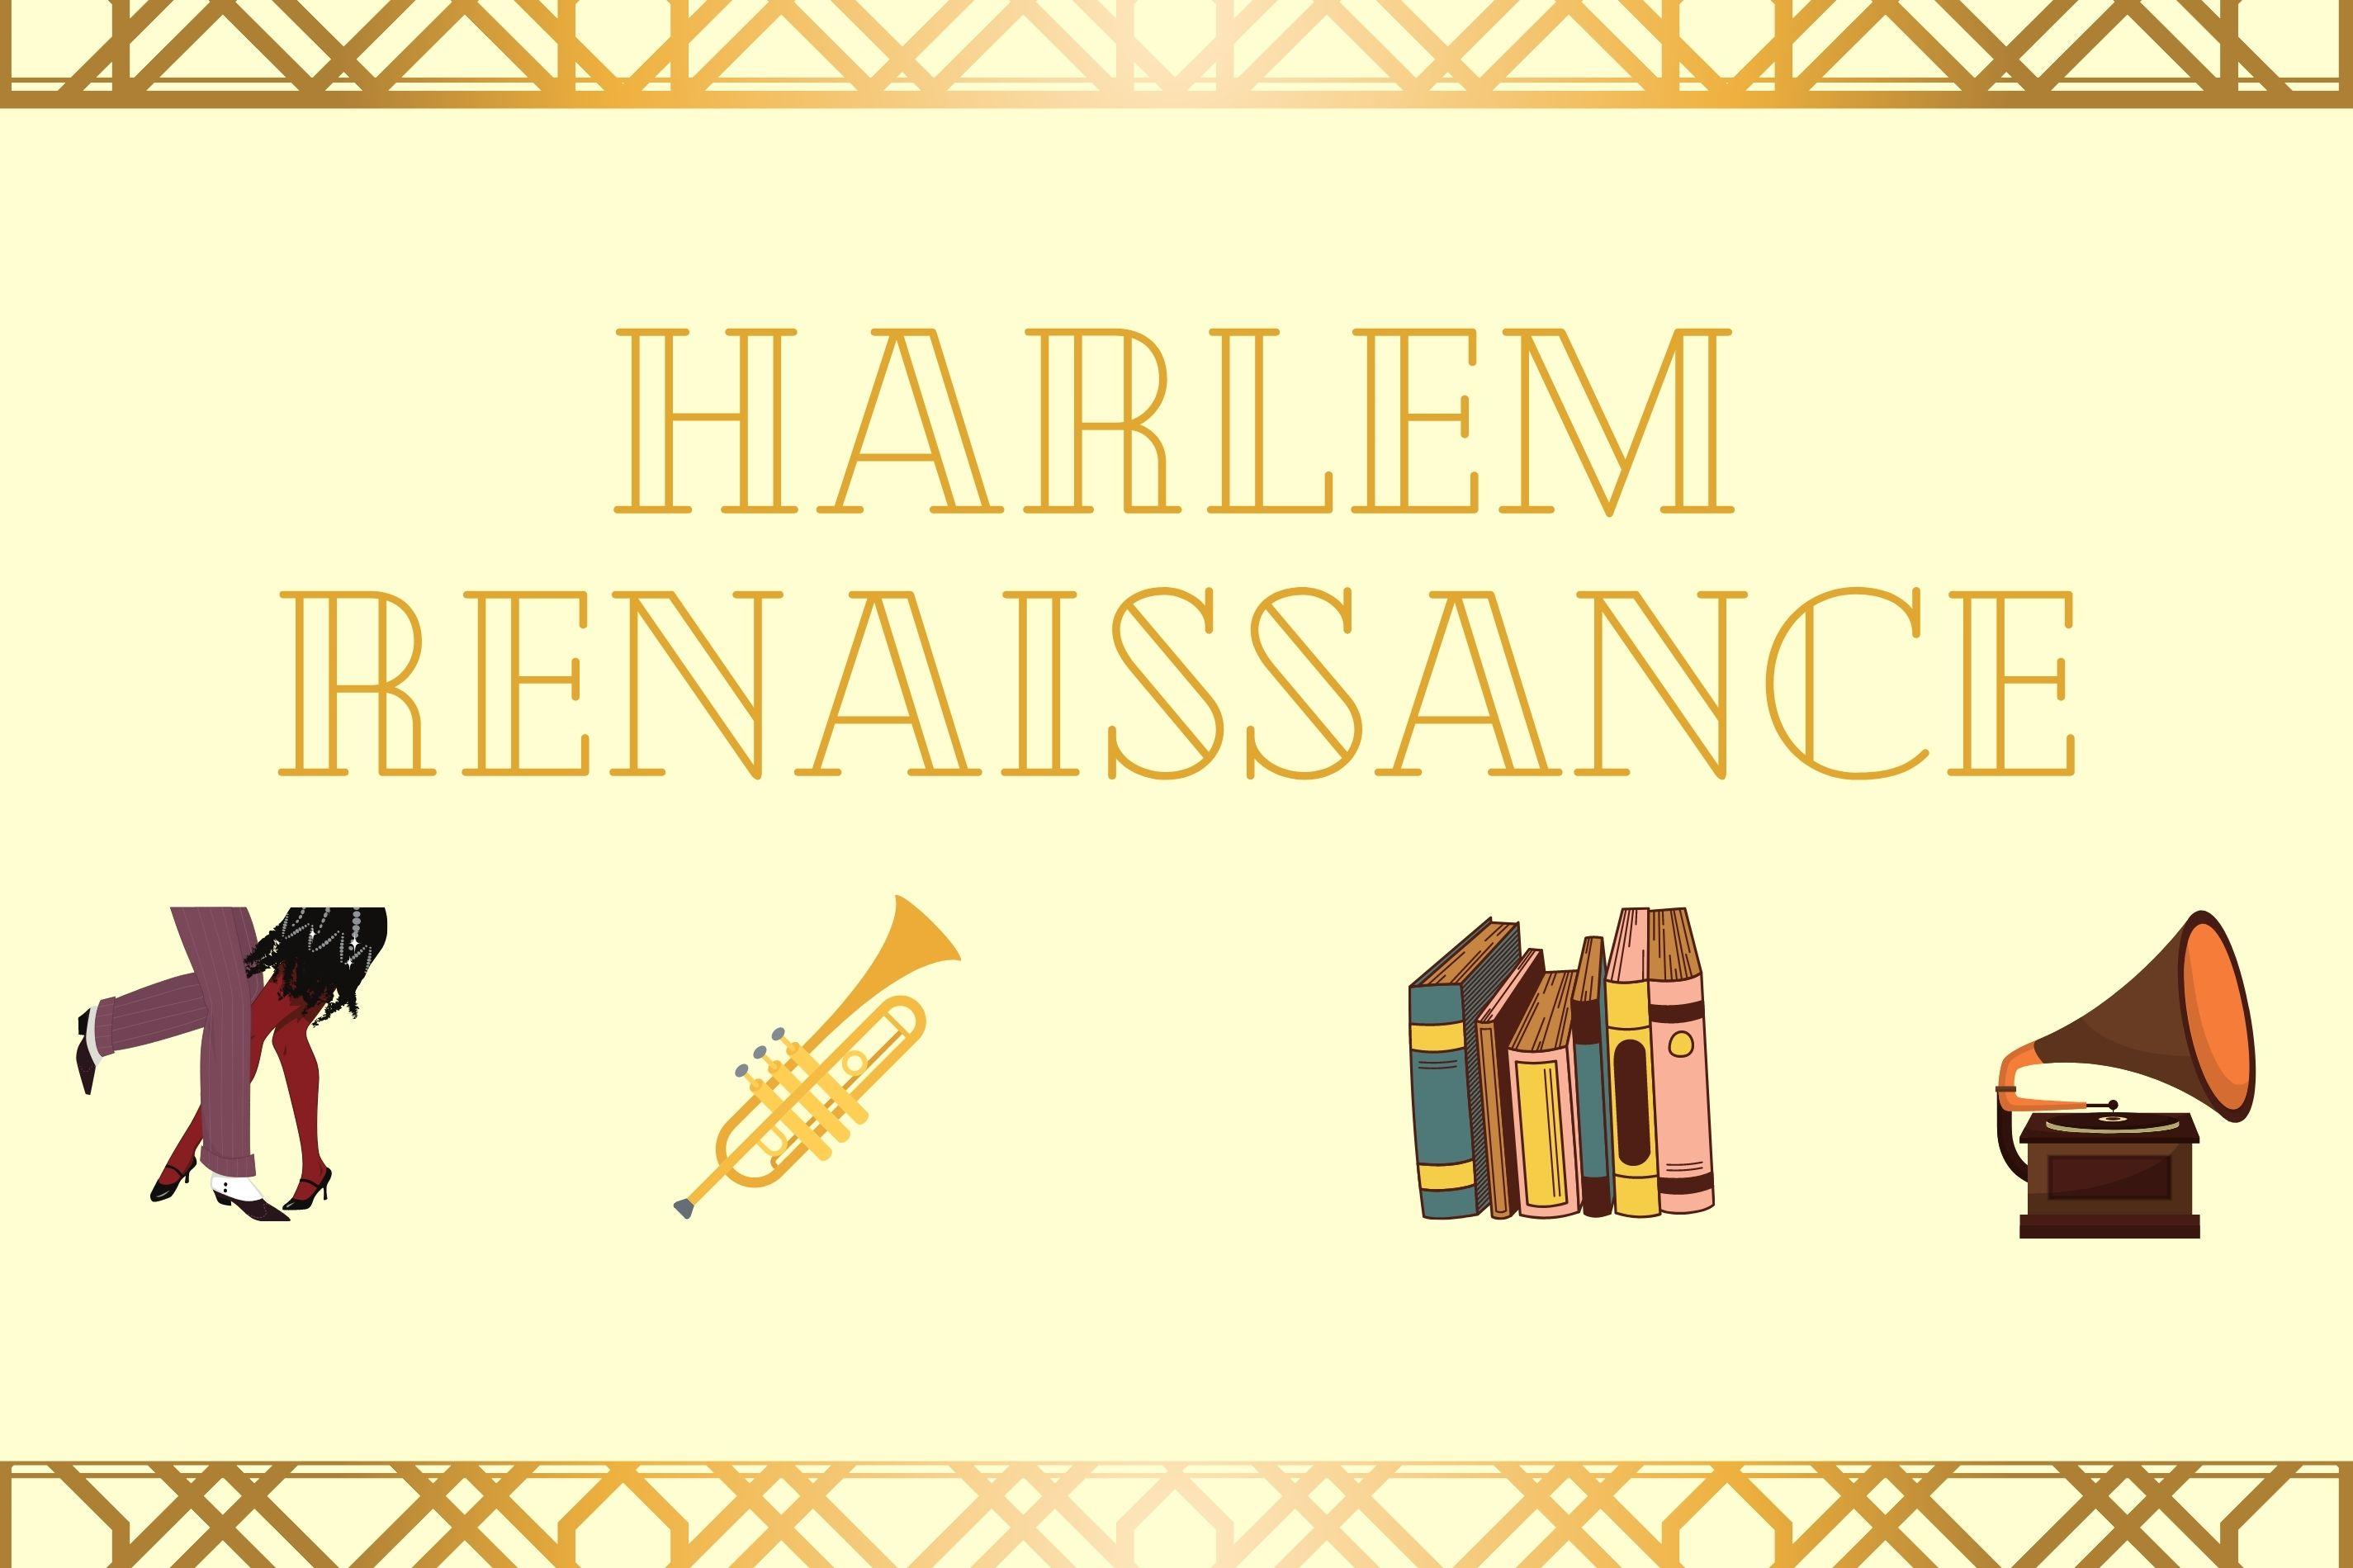 Celebrate the 100th Anniversary of the Harlem Renaissance